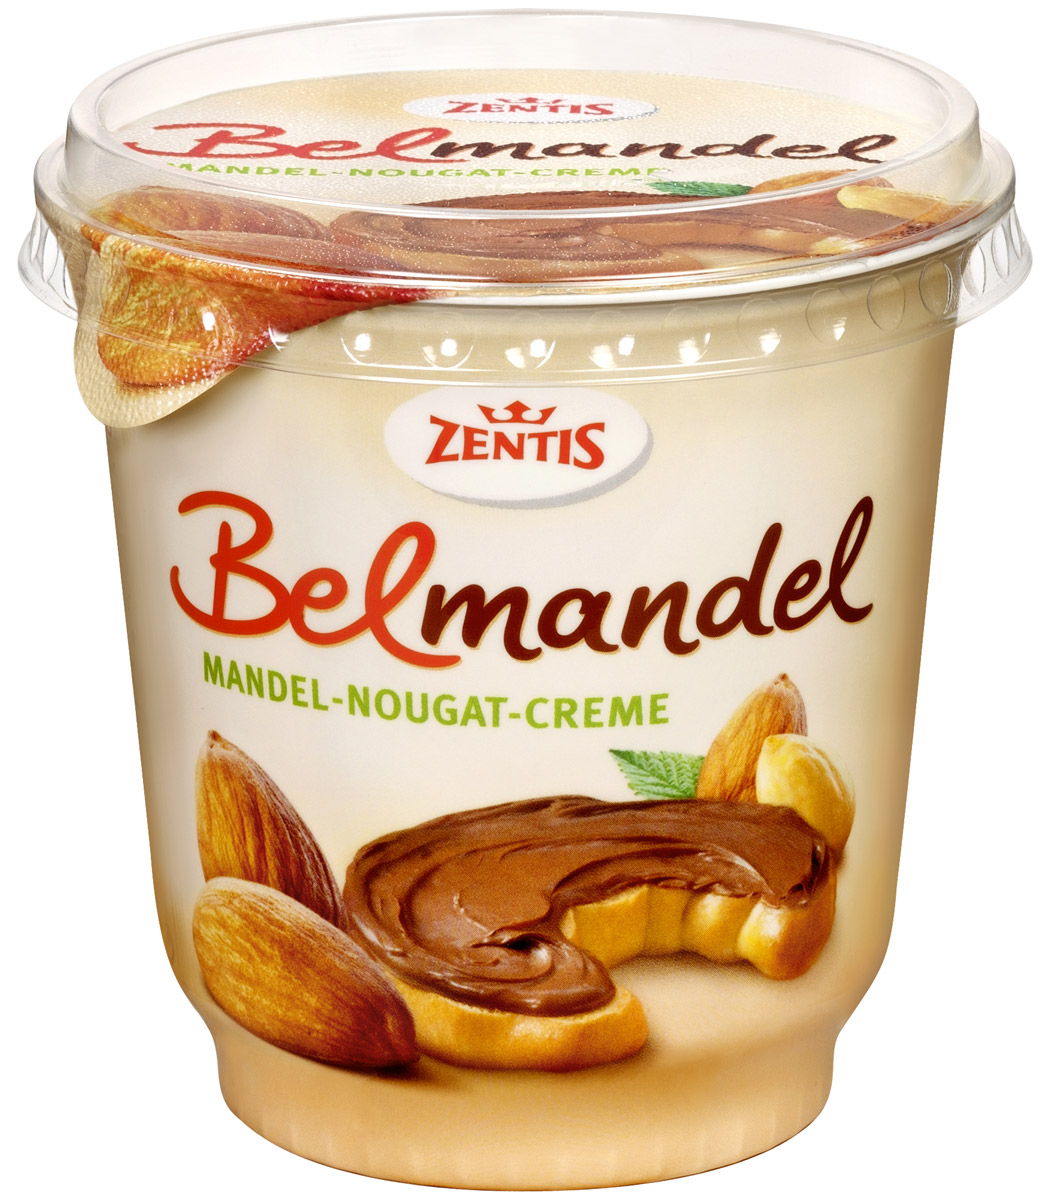 Zentis Belmandel шоколадная паста с миндалем и какао, 400 г romeo rossi паста яичная 4 яйца строцапрети 500 г